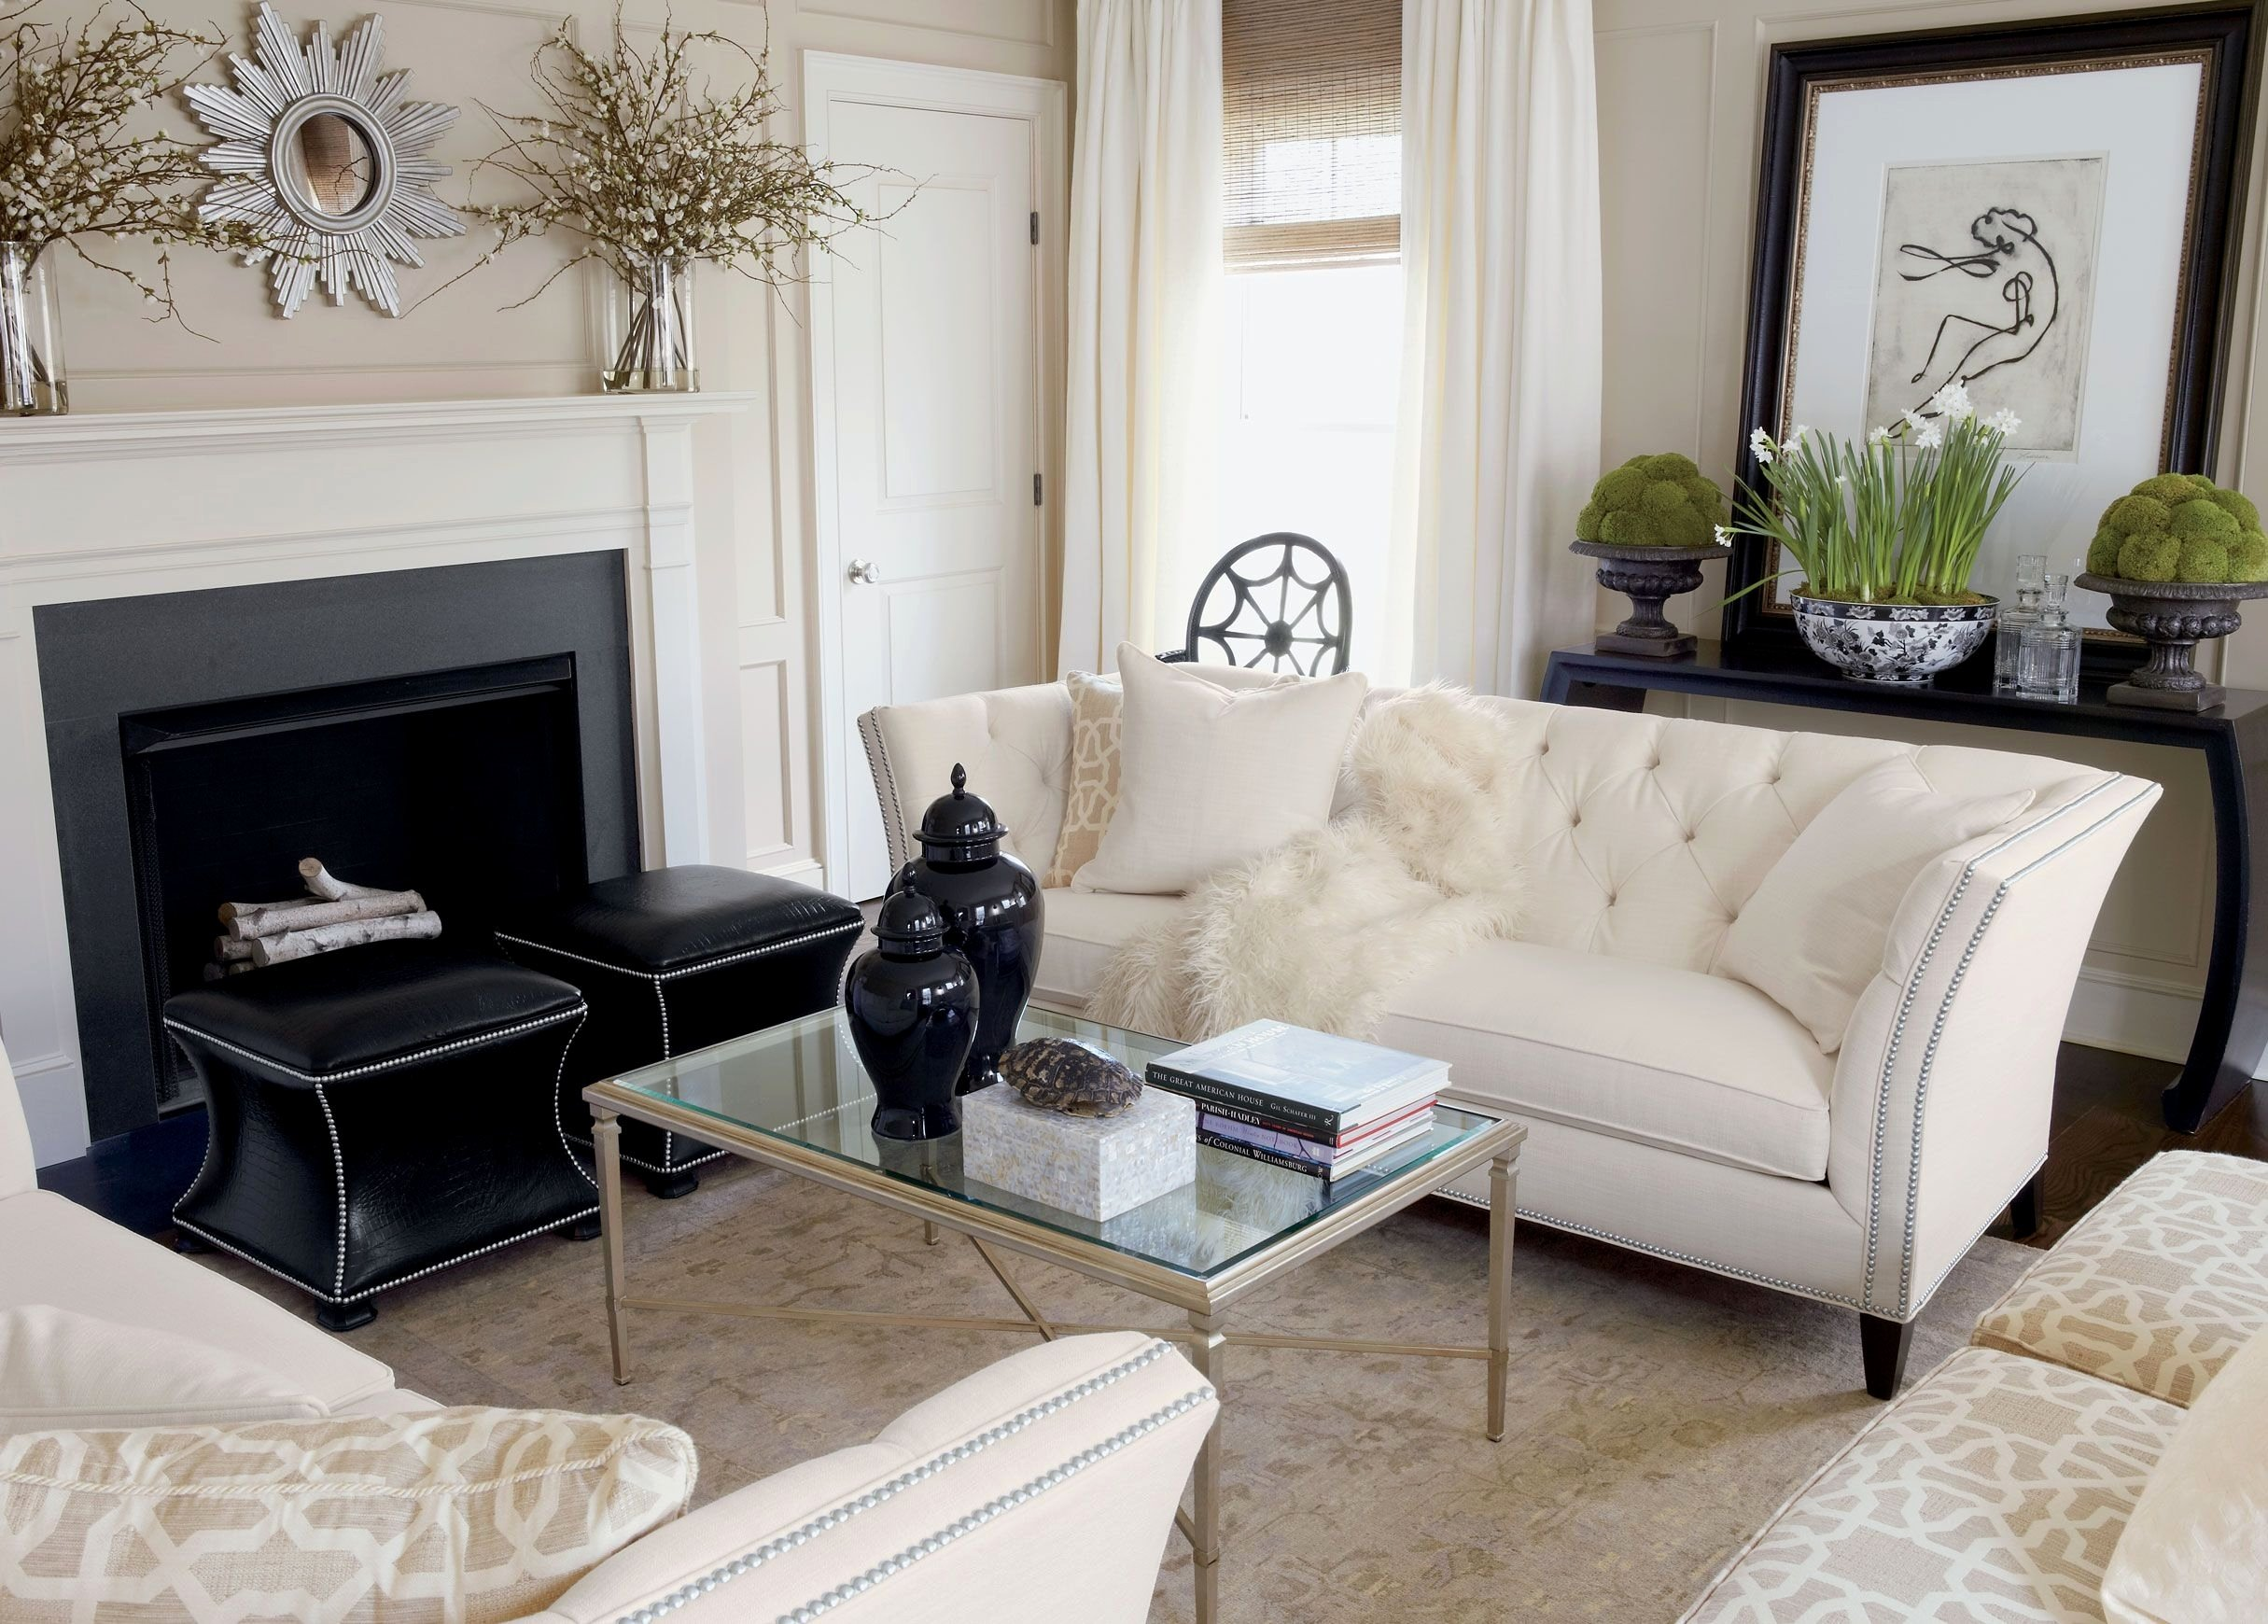 10 Lovable Leather Sofa Living Room Ideas furniture cream leather sofa living room ideas exquisite on 2021